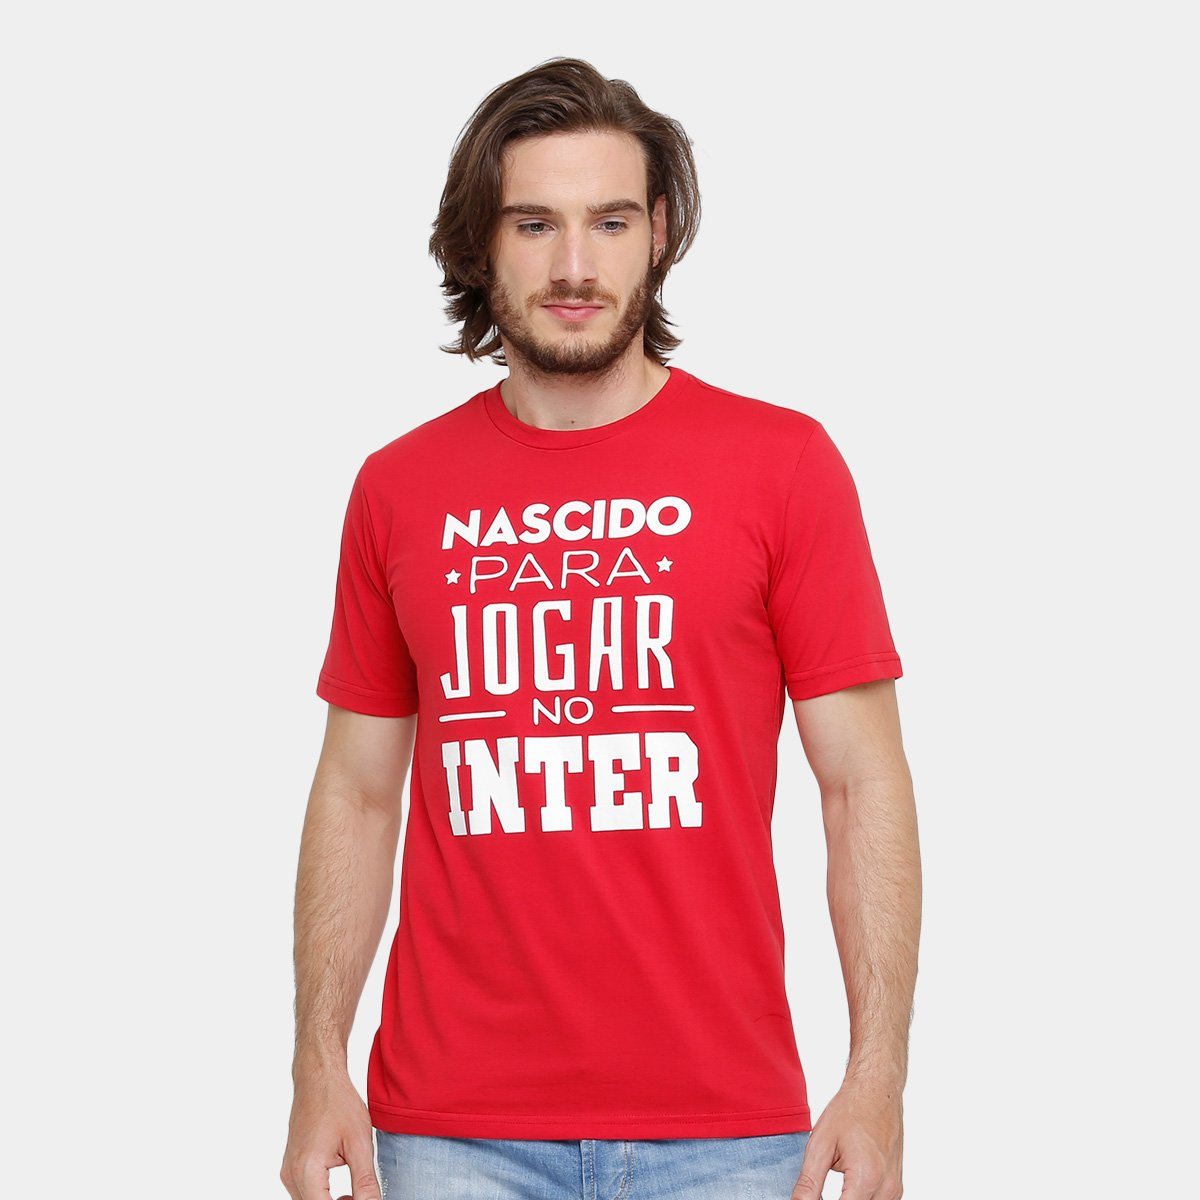 71ffa82f070 Camiseta Internacional Nascido para Jogar Masculina - Compre Agora ...